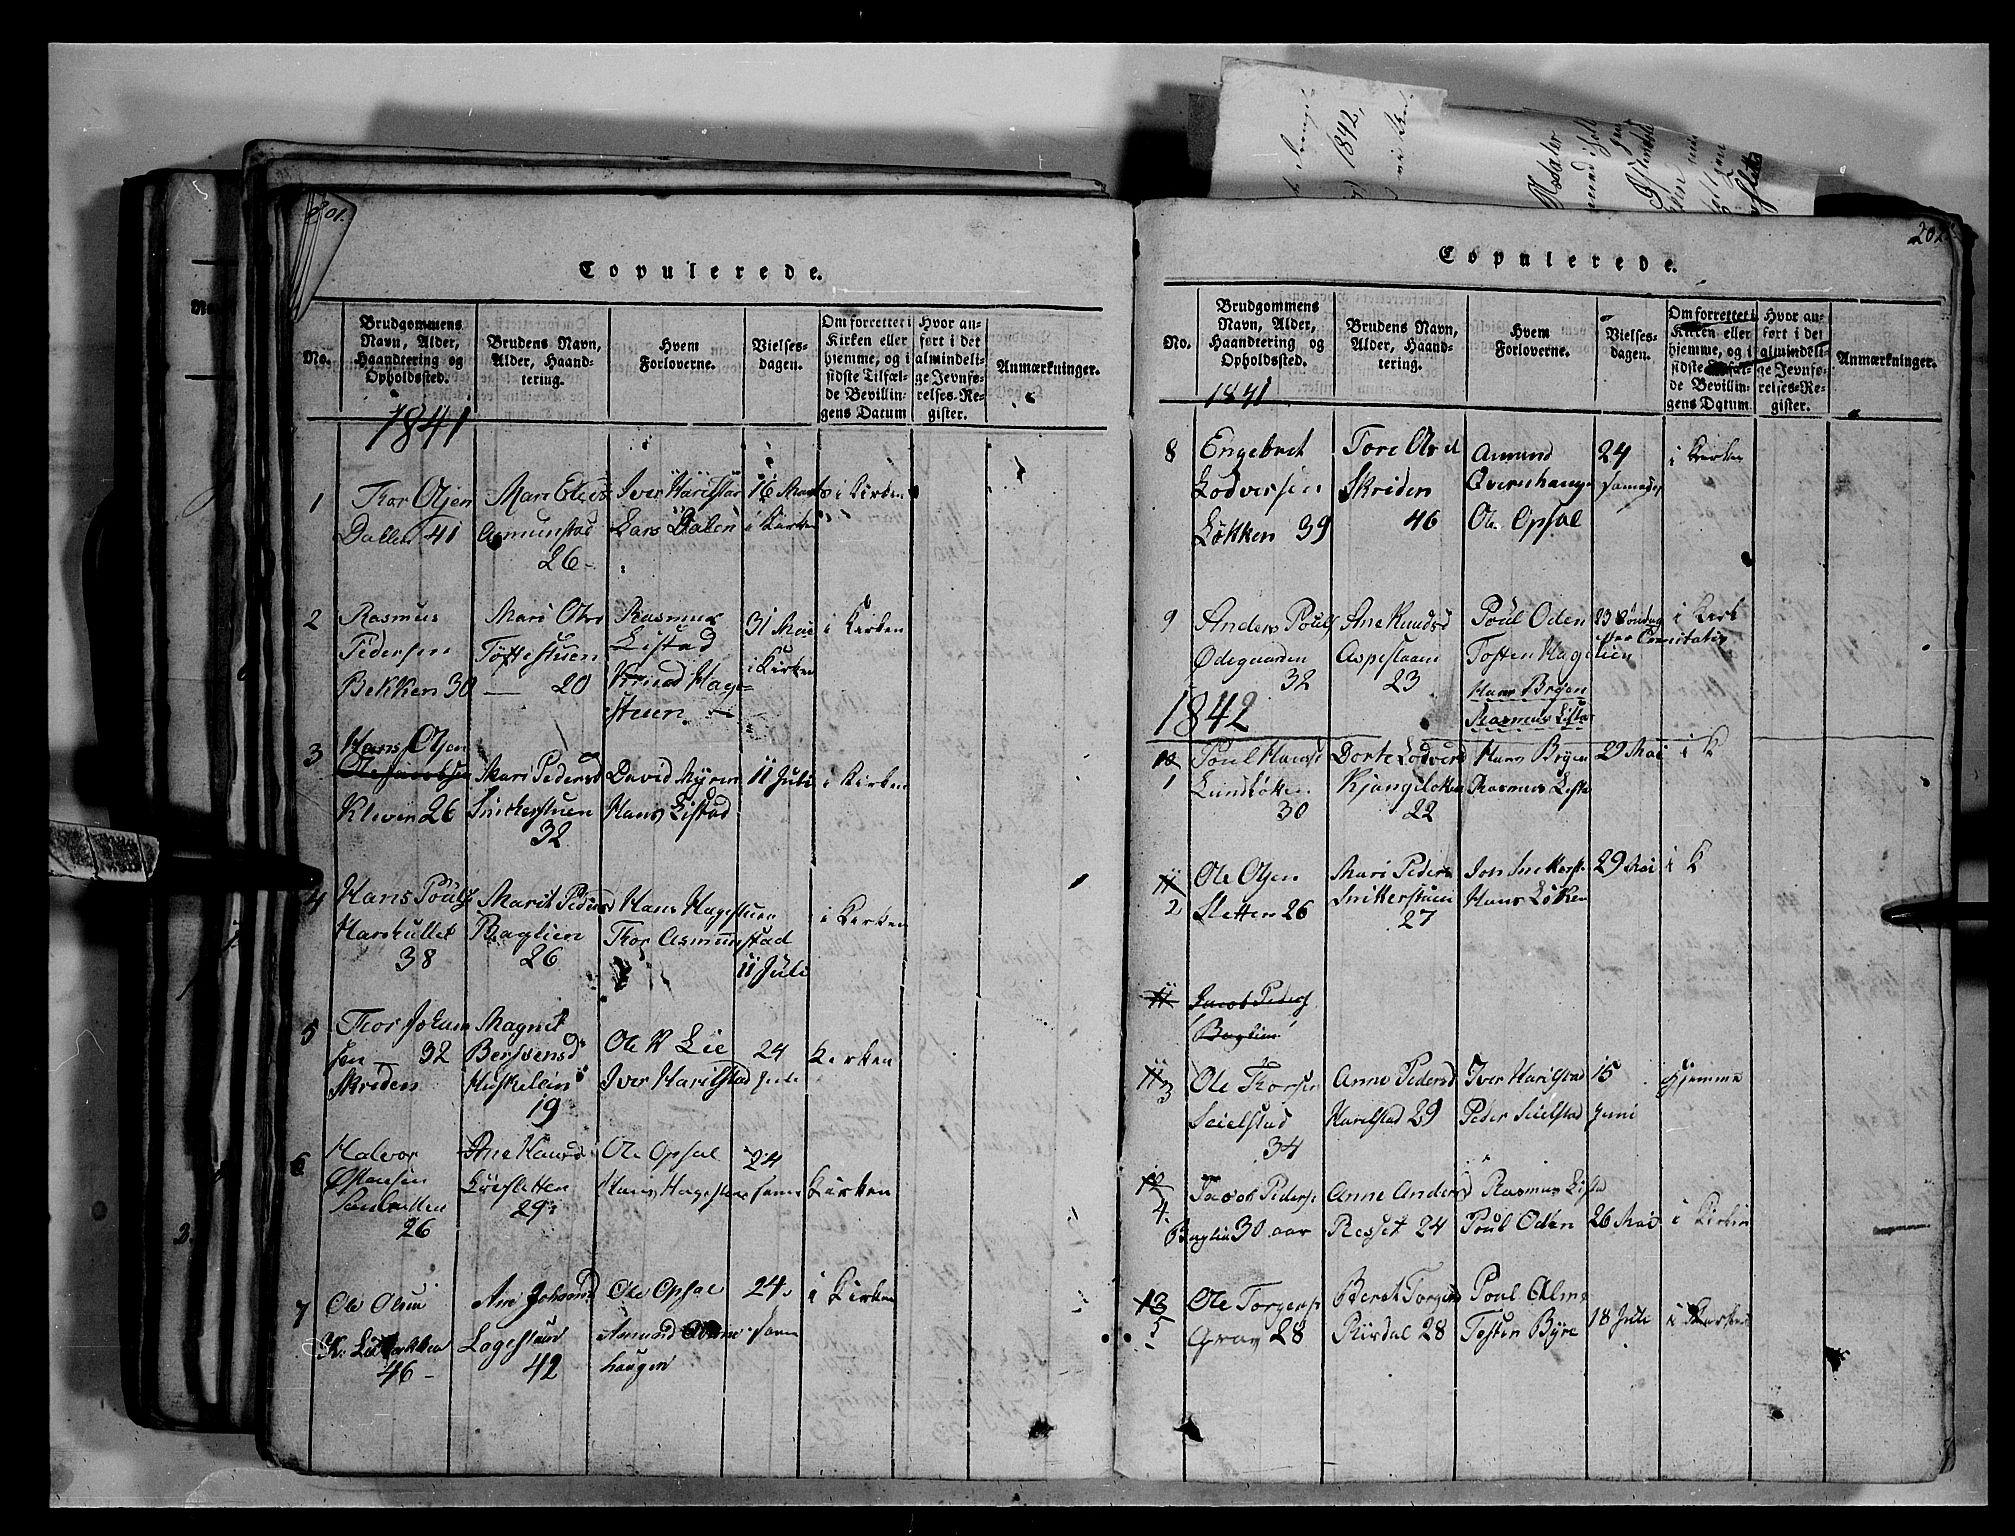 SAH, Fron prestekontor, H/Ha/Hab/L0003: Klokkerbok nr. 3, 1816-1850, s. 202